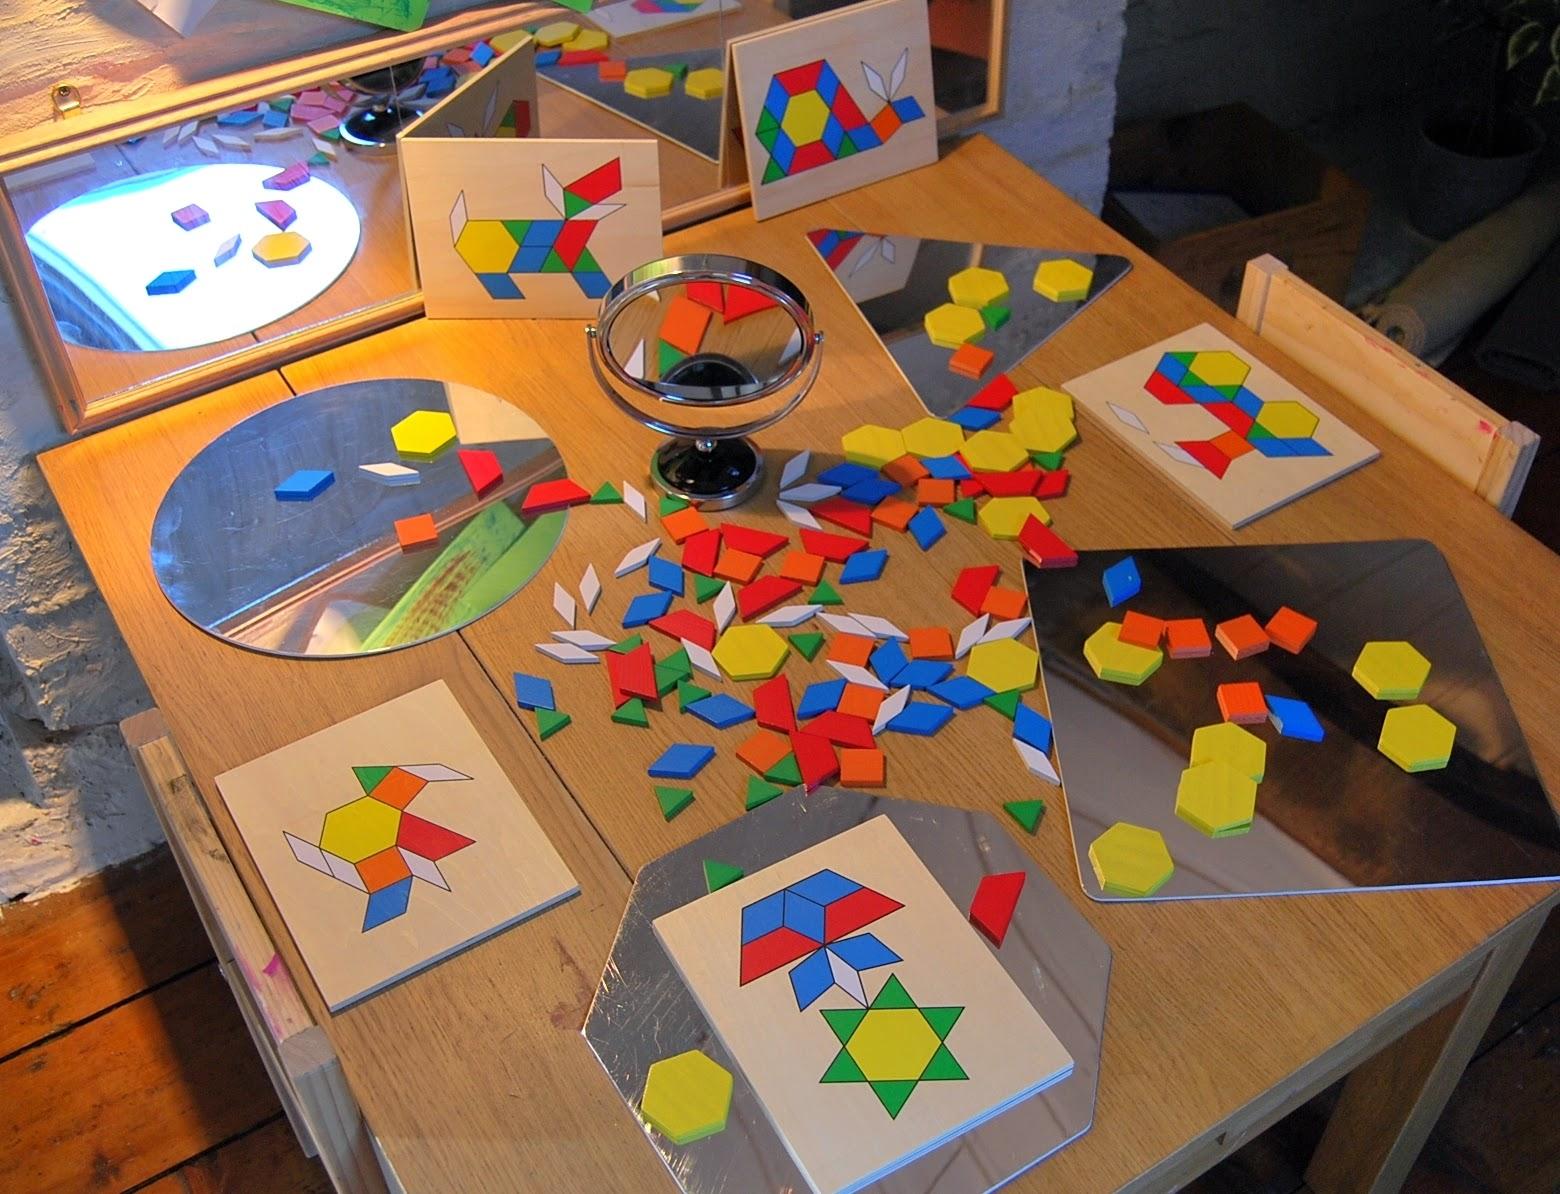 jeux couleur montessori activits montessori t montessori. Black Bedroom Furniture Sets. Home Design Ideas